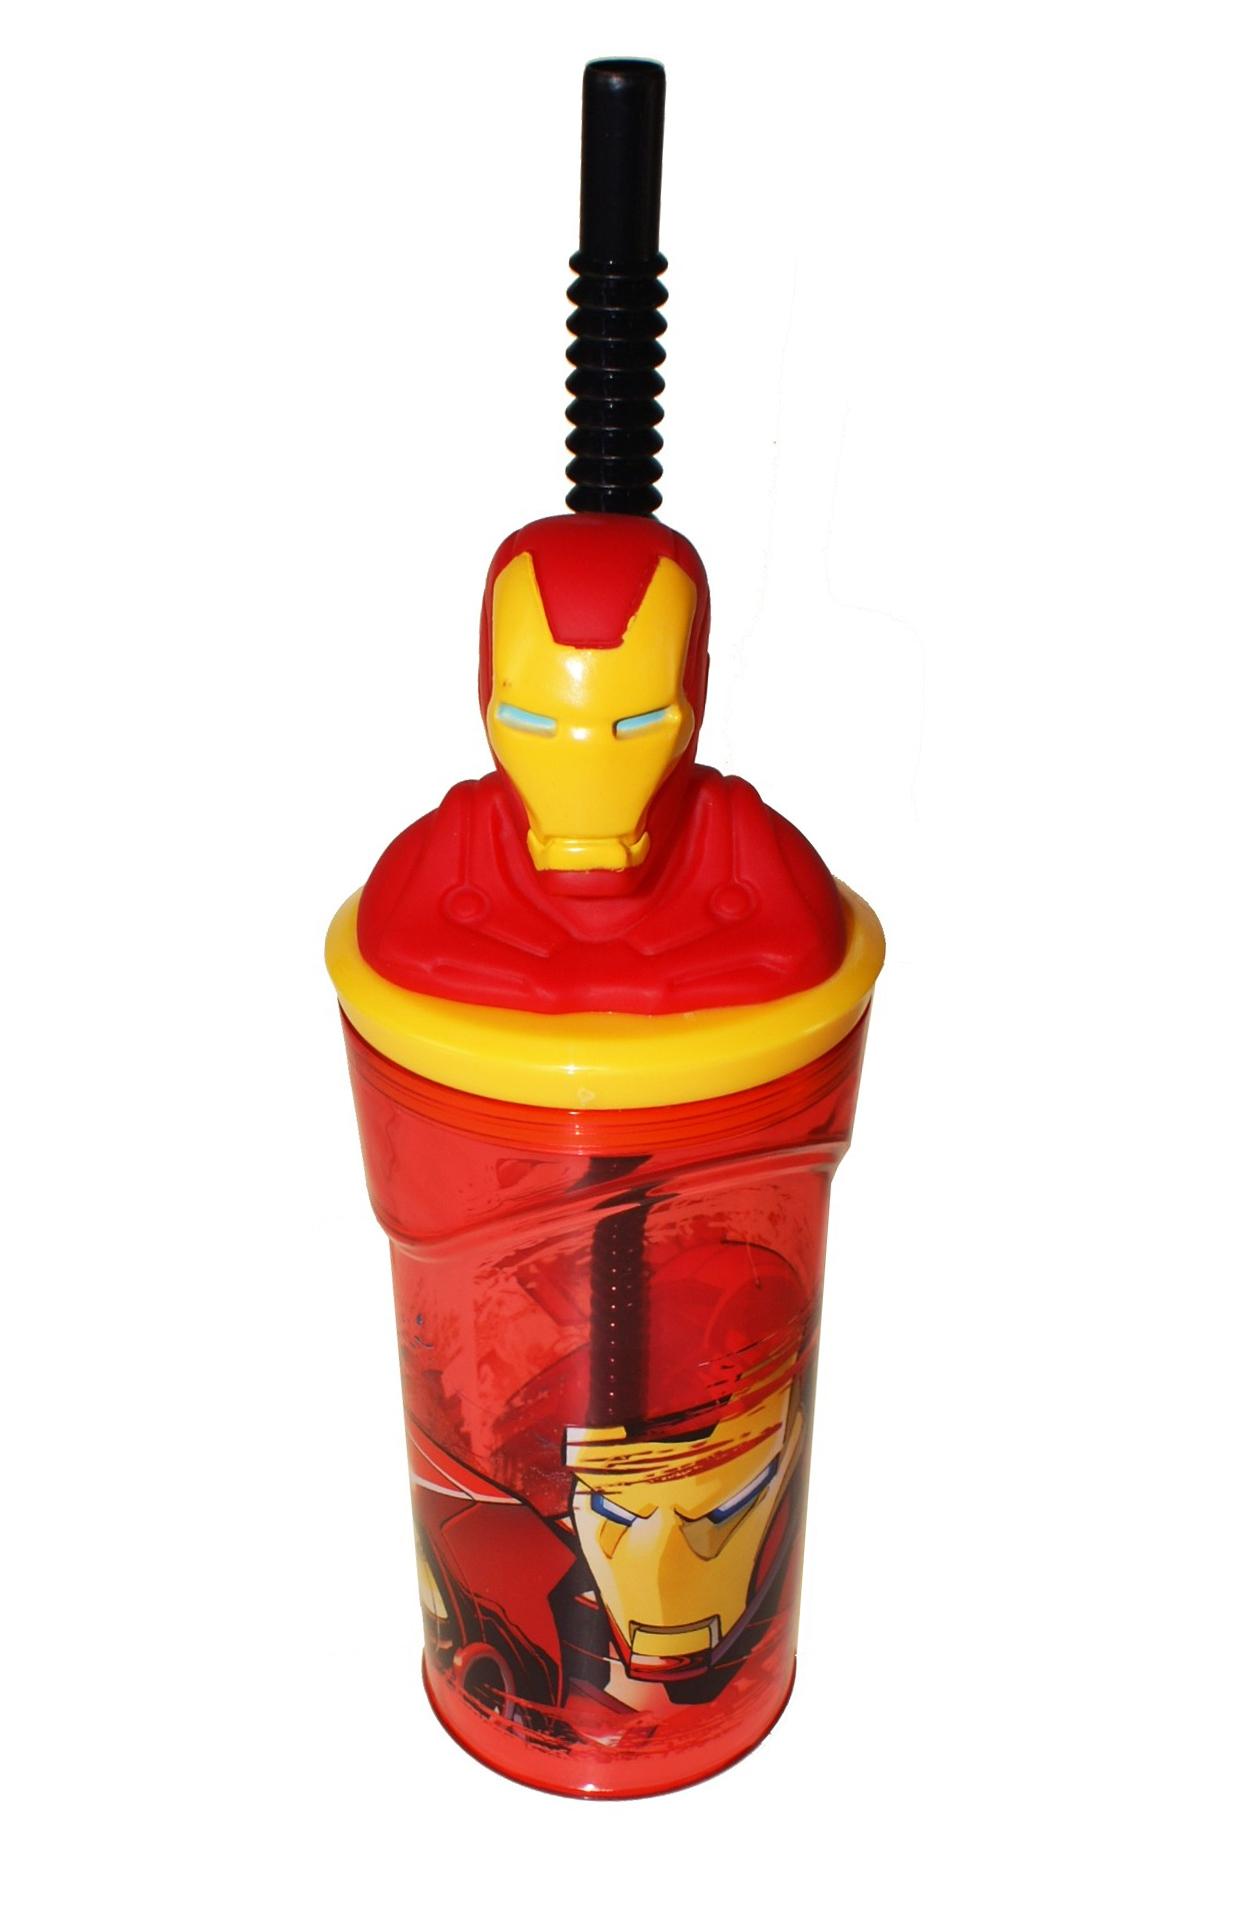 Superhero Iron Man Figurine '3d Head' Bottle with Straw